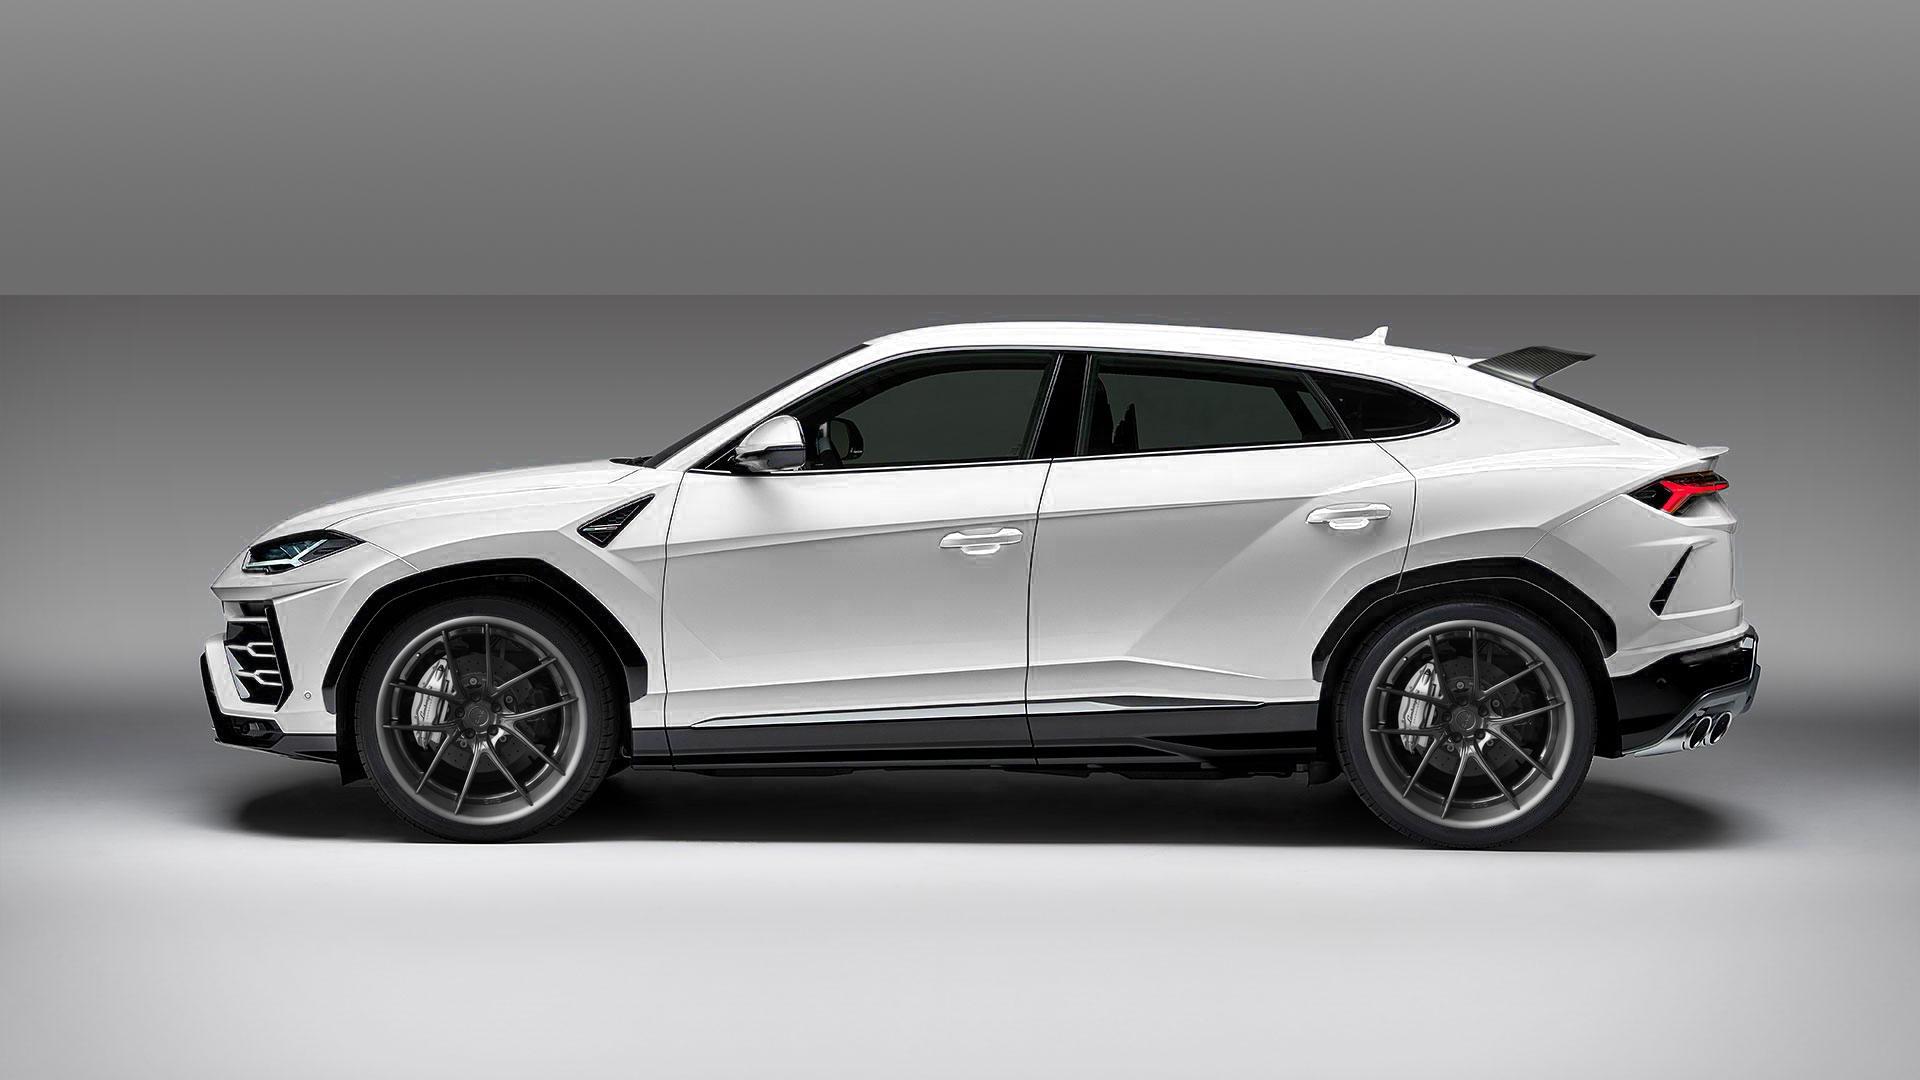 Dmc Wide Body Carbon Fiber Body Kit For The Lamborghini Urus